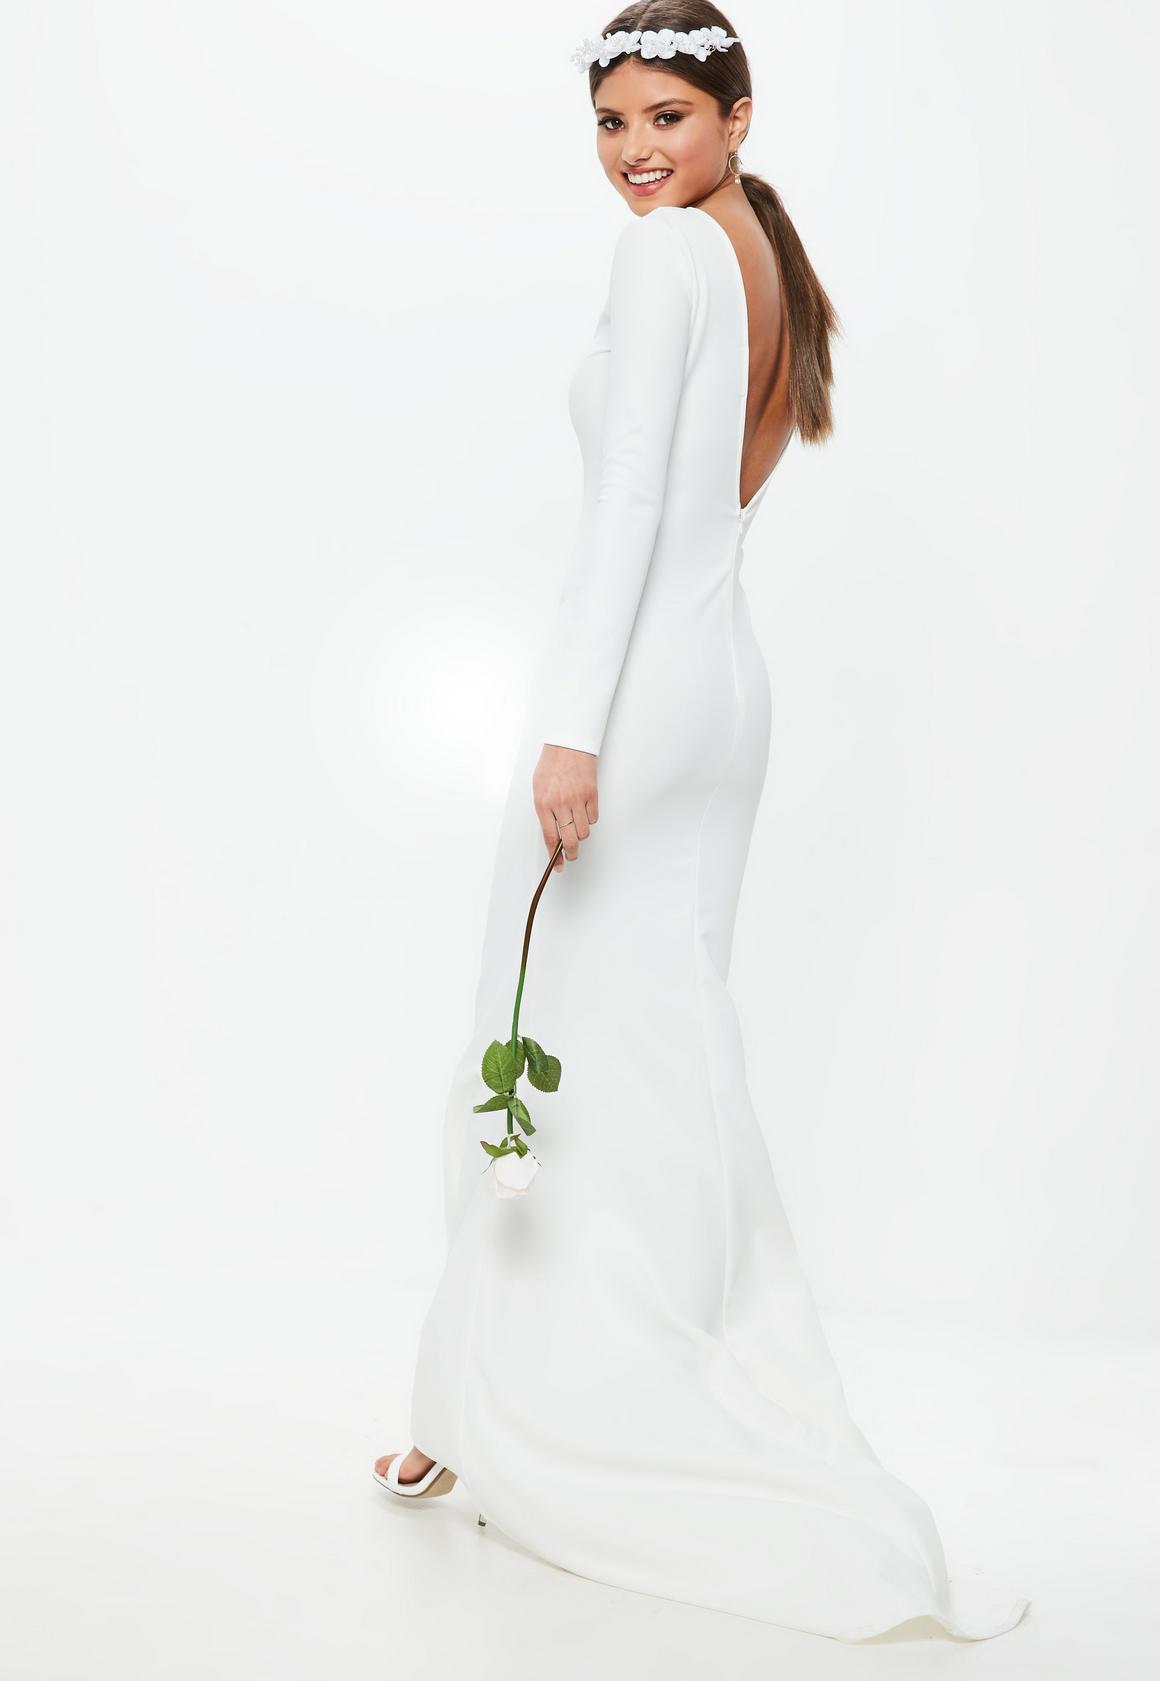 Bridal White Long Sleeve Open Back Fishtail Dress | Missguided